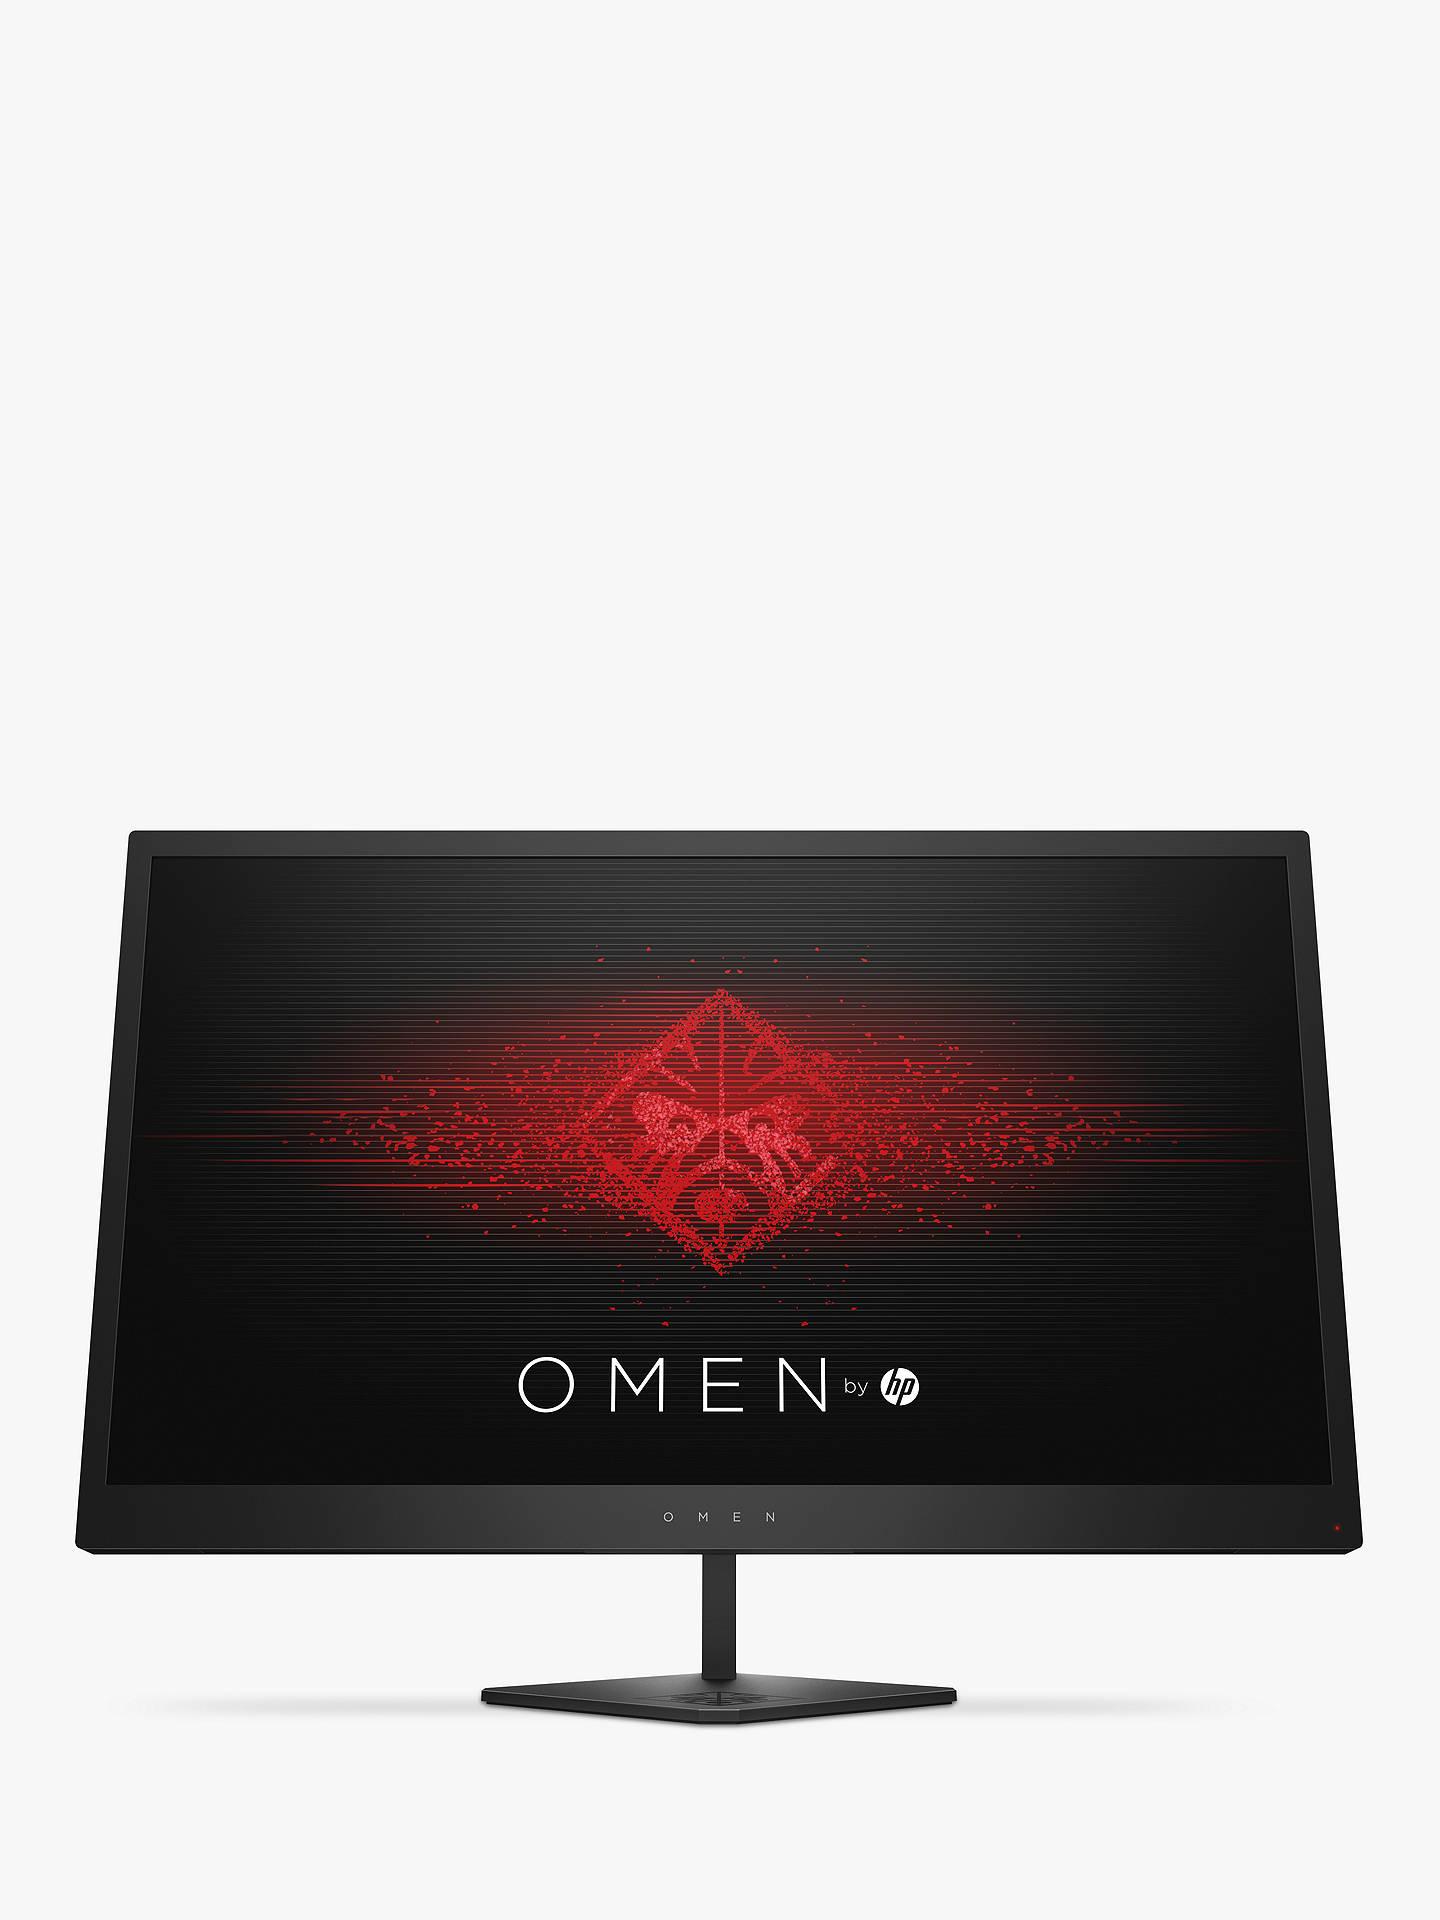 HP Omen 25 Full HD Gaming Monitor, 24 5